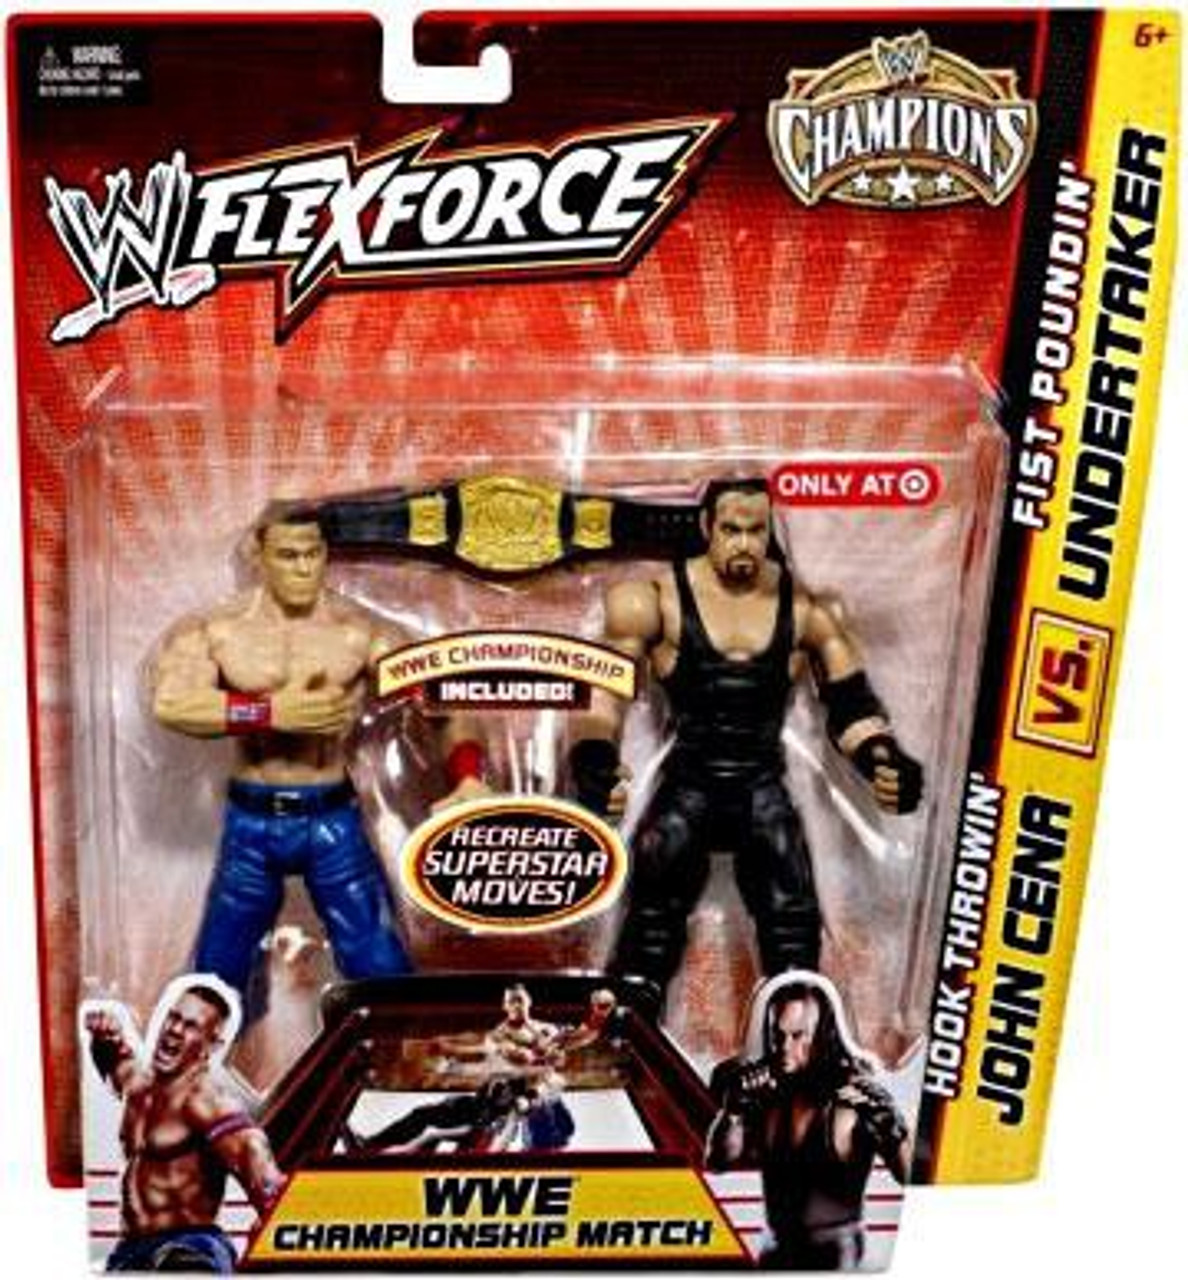 WWE Wrestling FlexForce Champions Hook Throwin' John Cena Vs. Fist Poundin' Undertaker Exclusive Action Figure 2-Pack